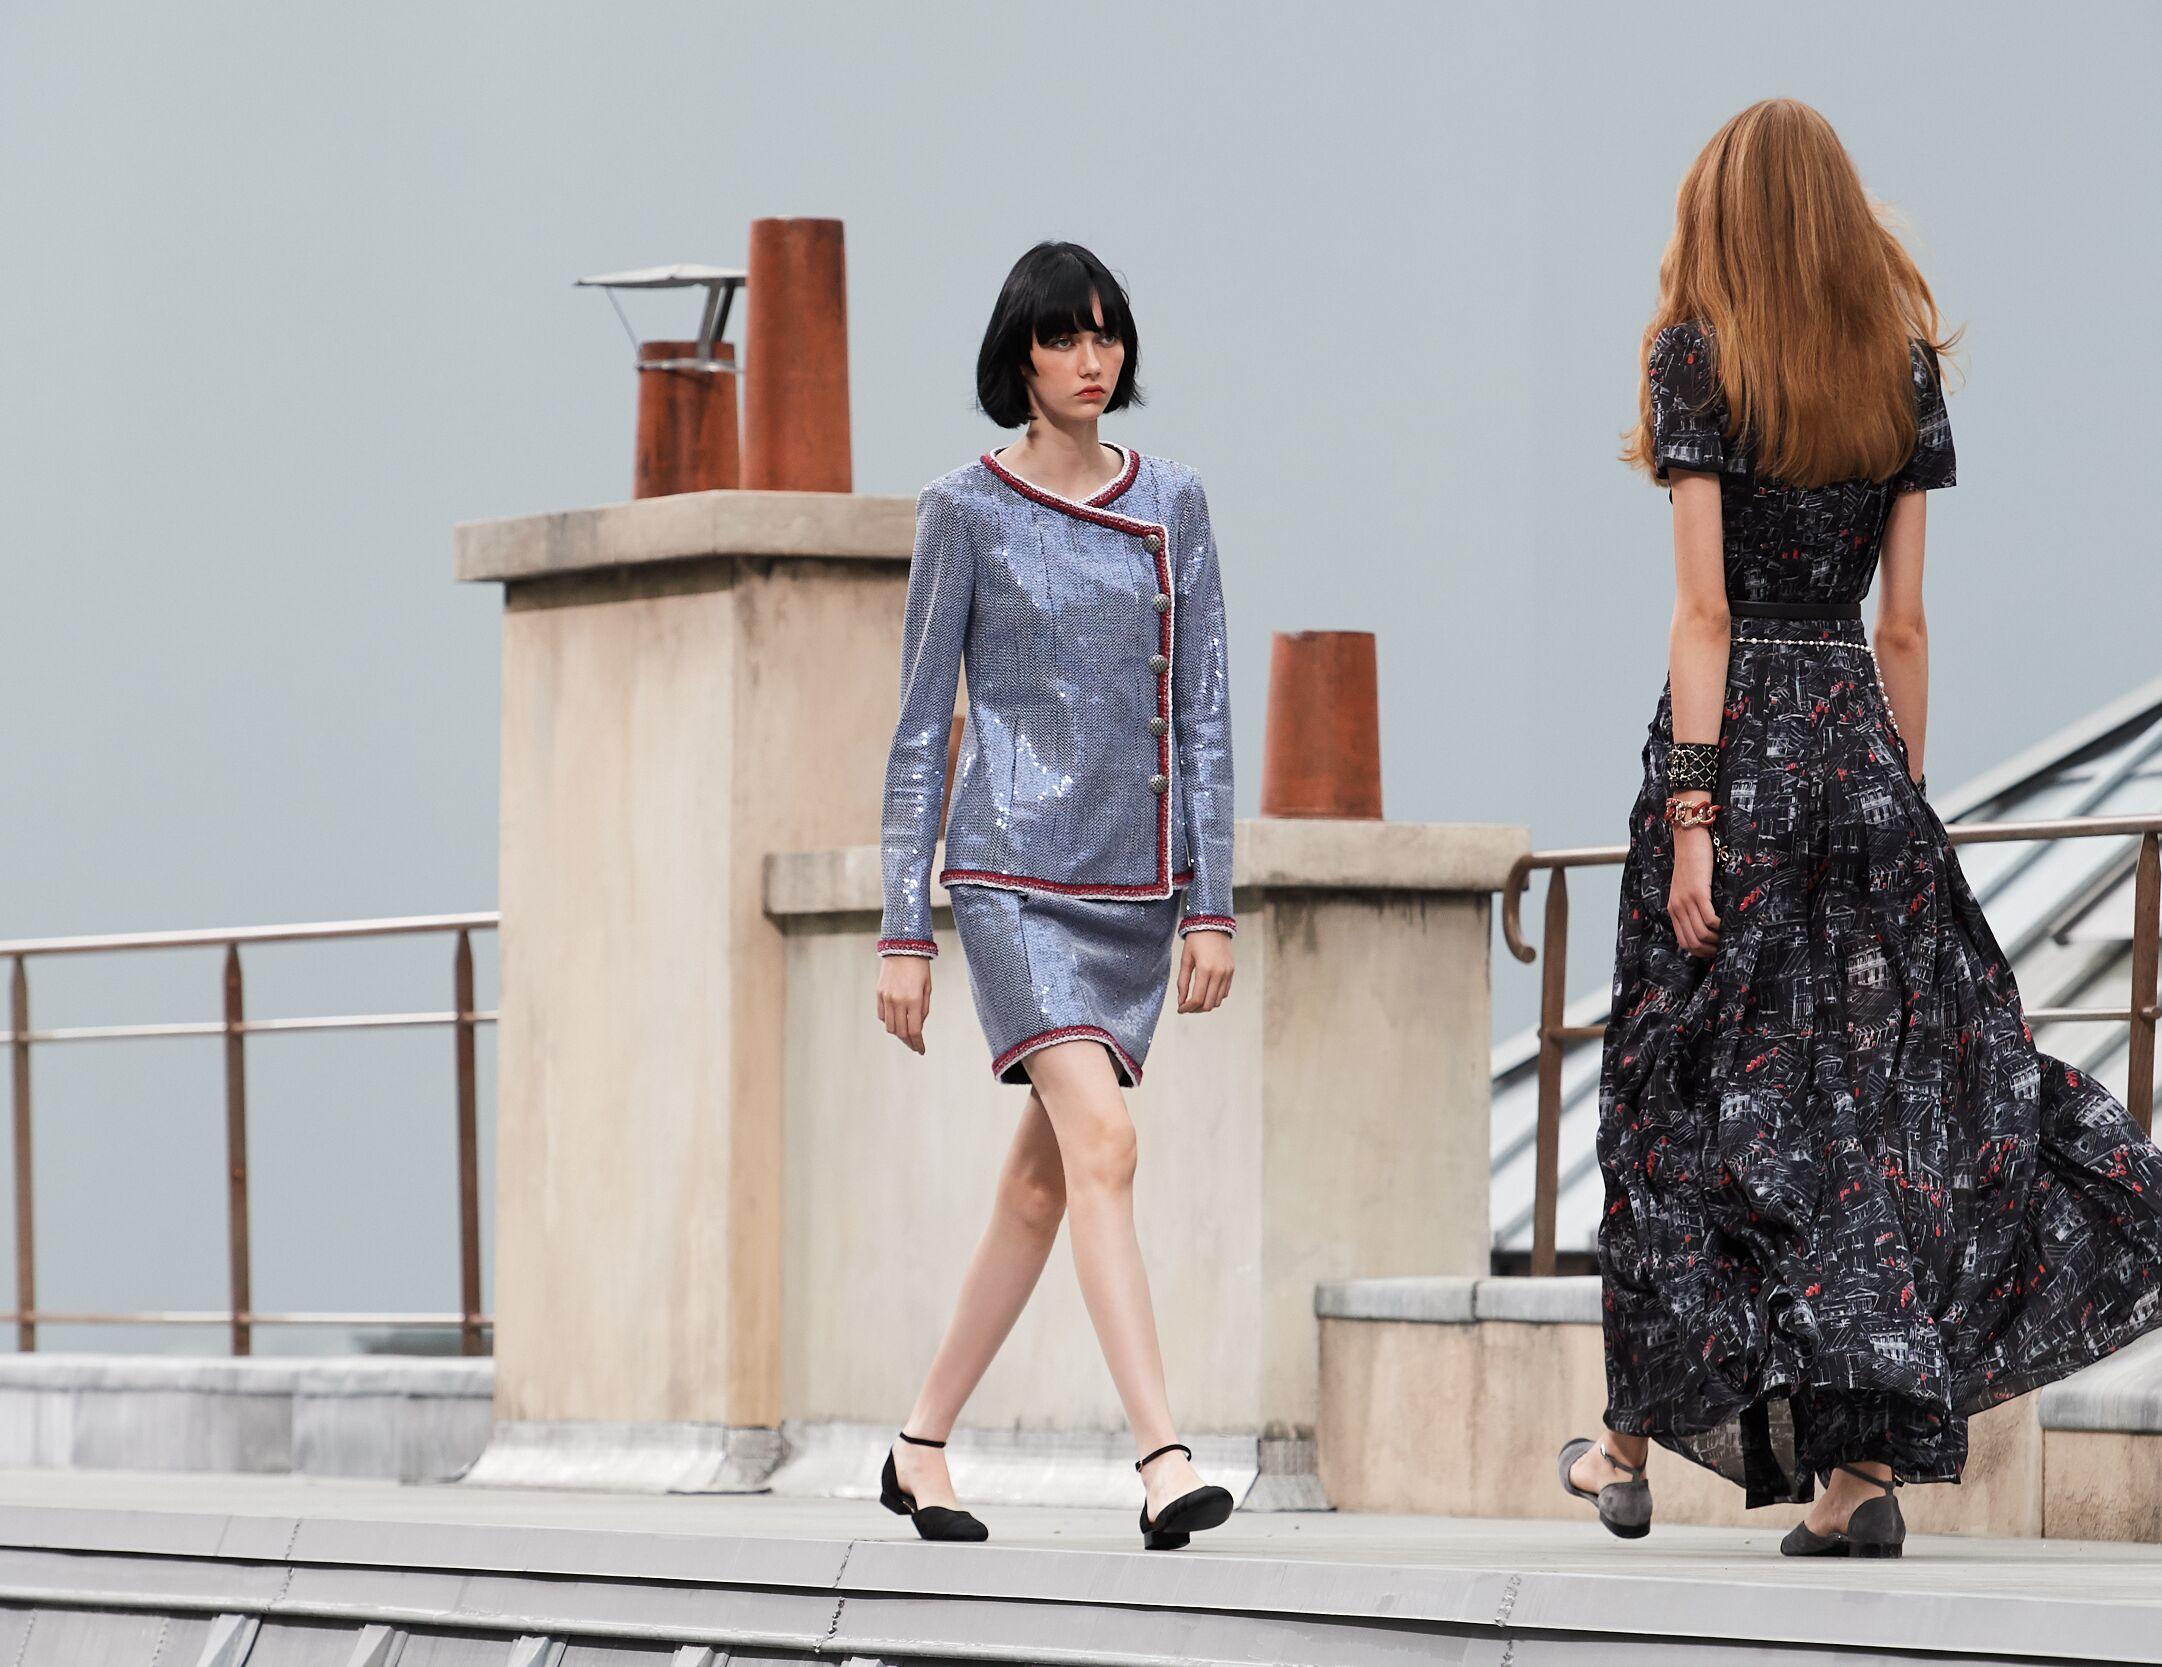 Catwalk Chanel Woman Fashion Show Summer 2020